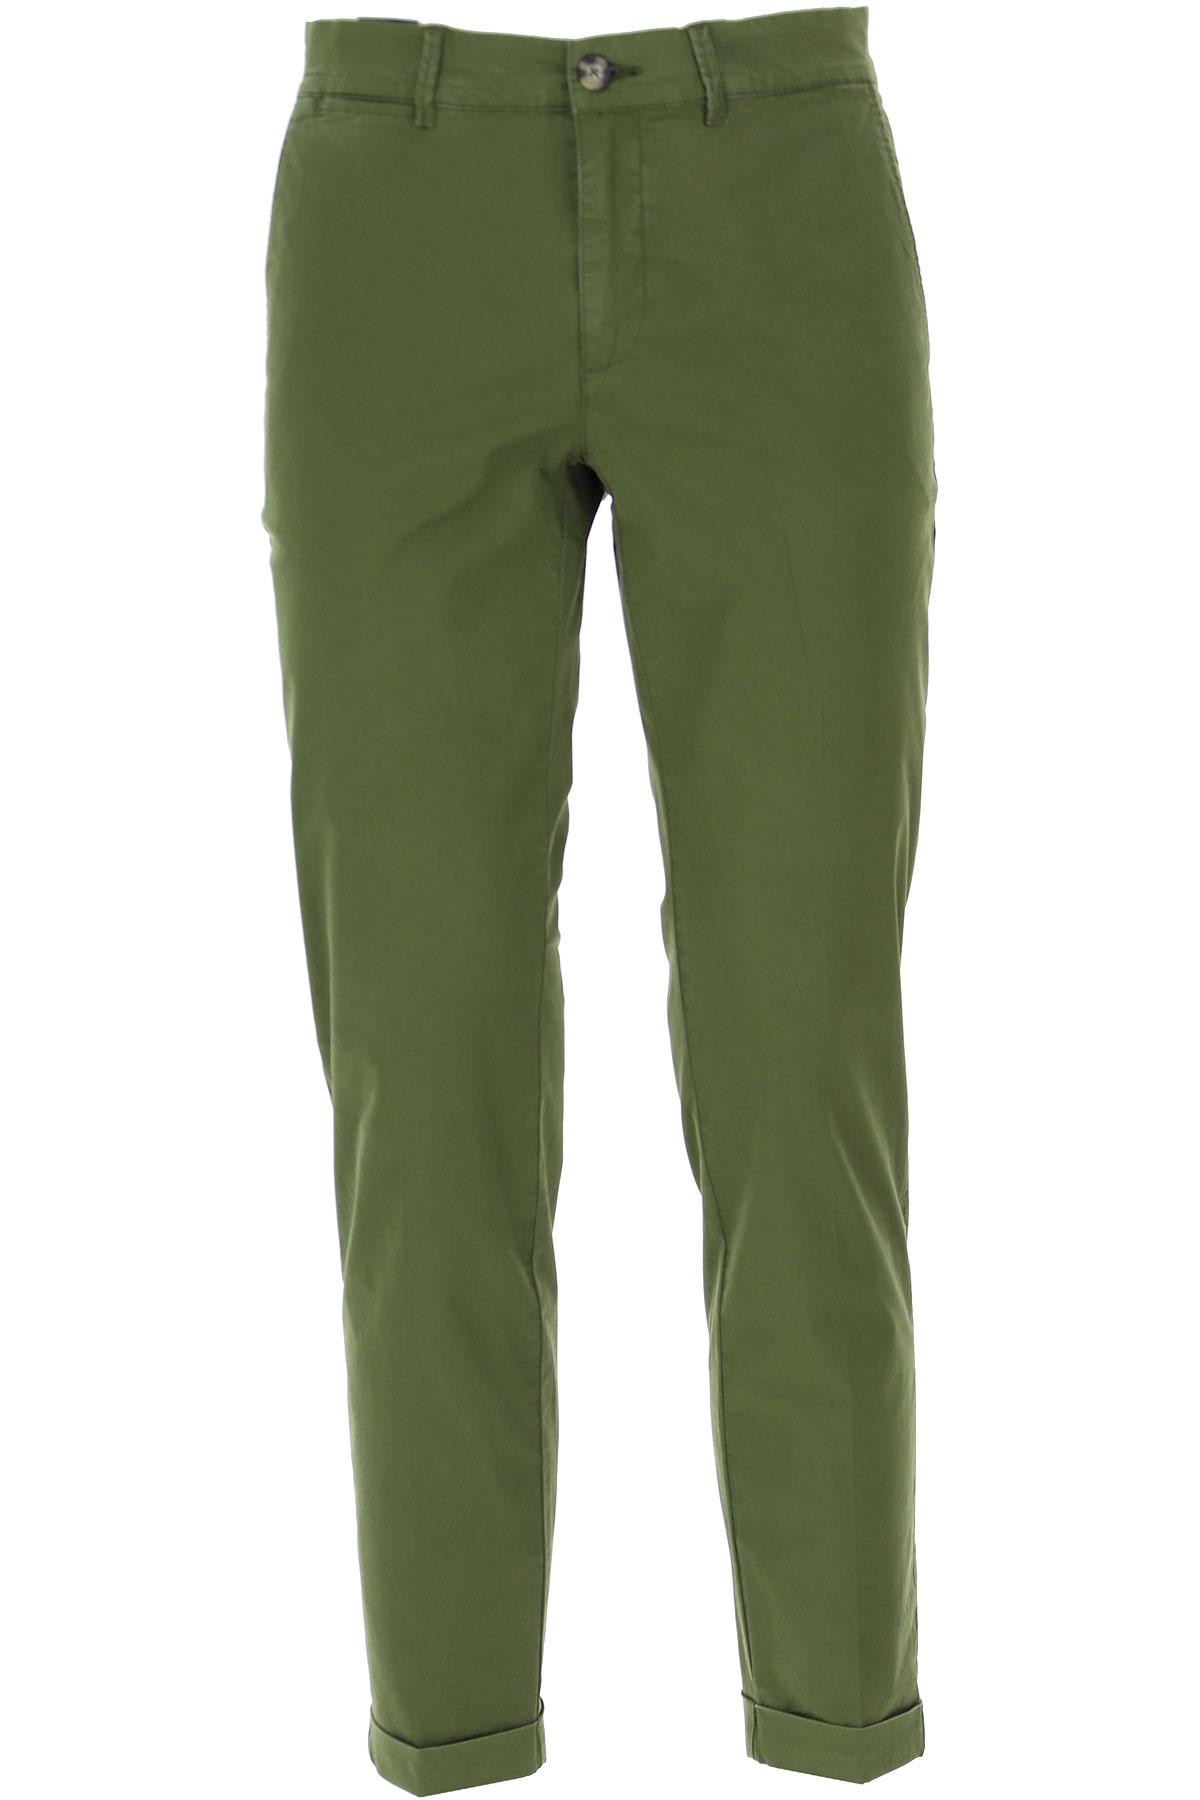 Jeckerson Pants for Men On Sale, Bottle Green, Cotton, 2019, 29 30 31 32 34 35 36 38 40